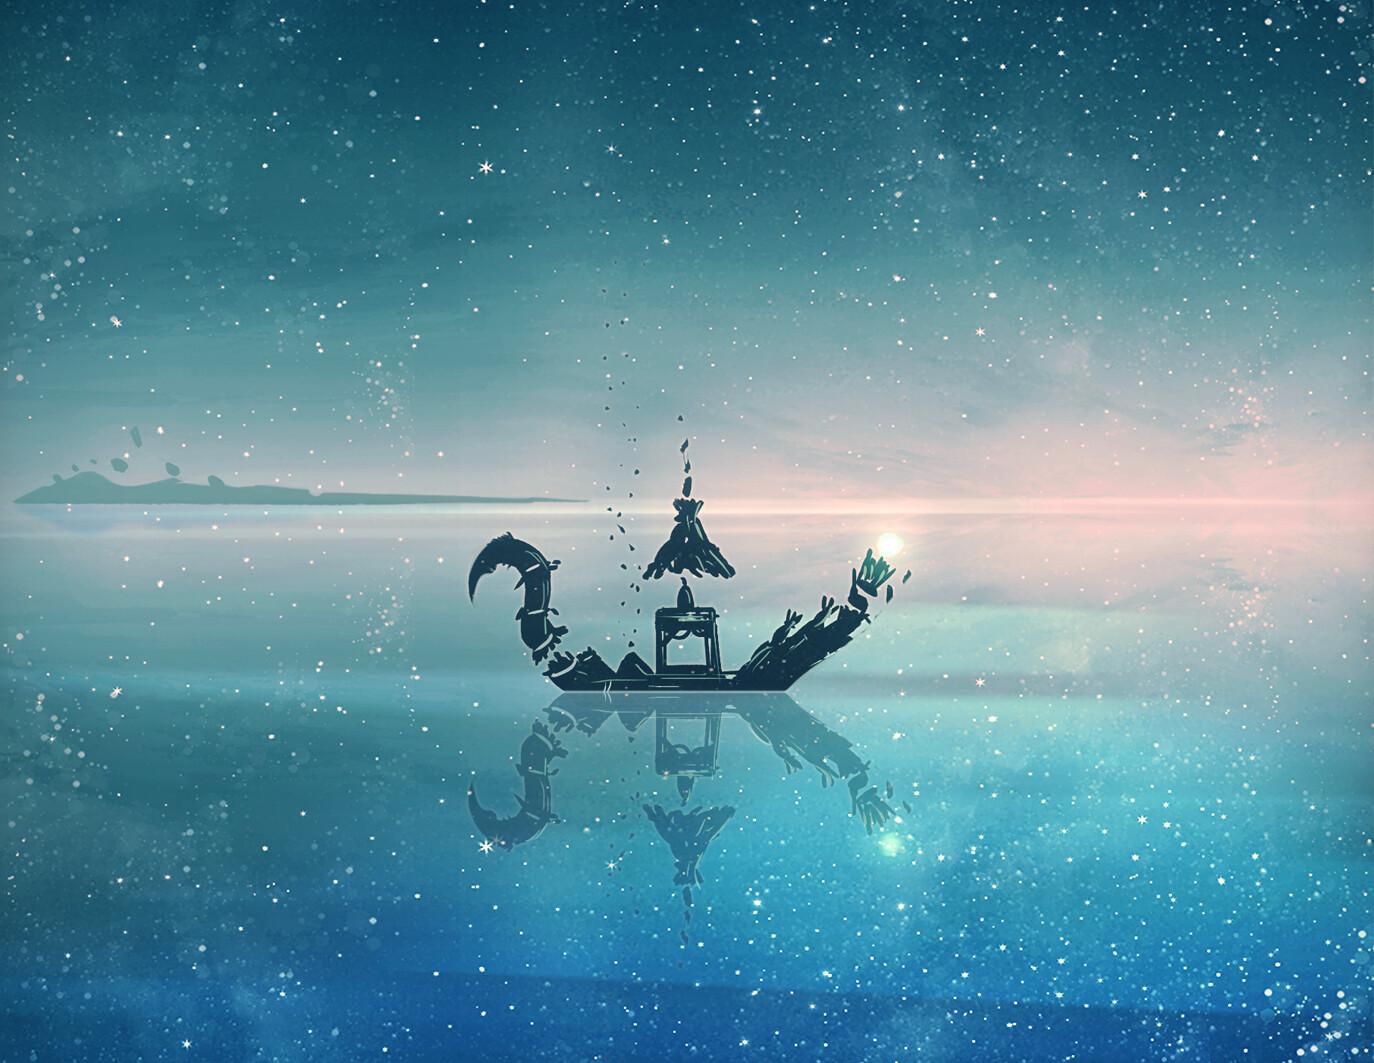 Christian benavides christian benavides pescando en el mar dle universo